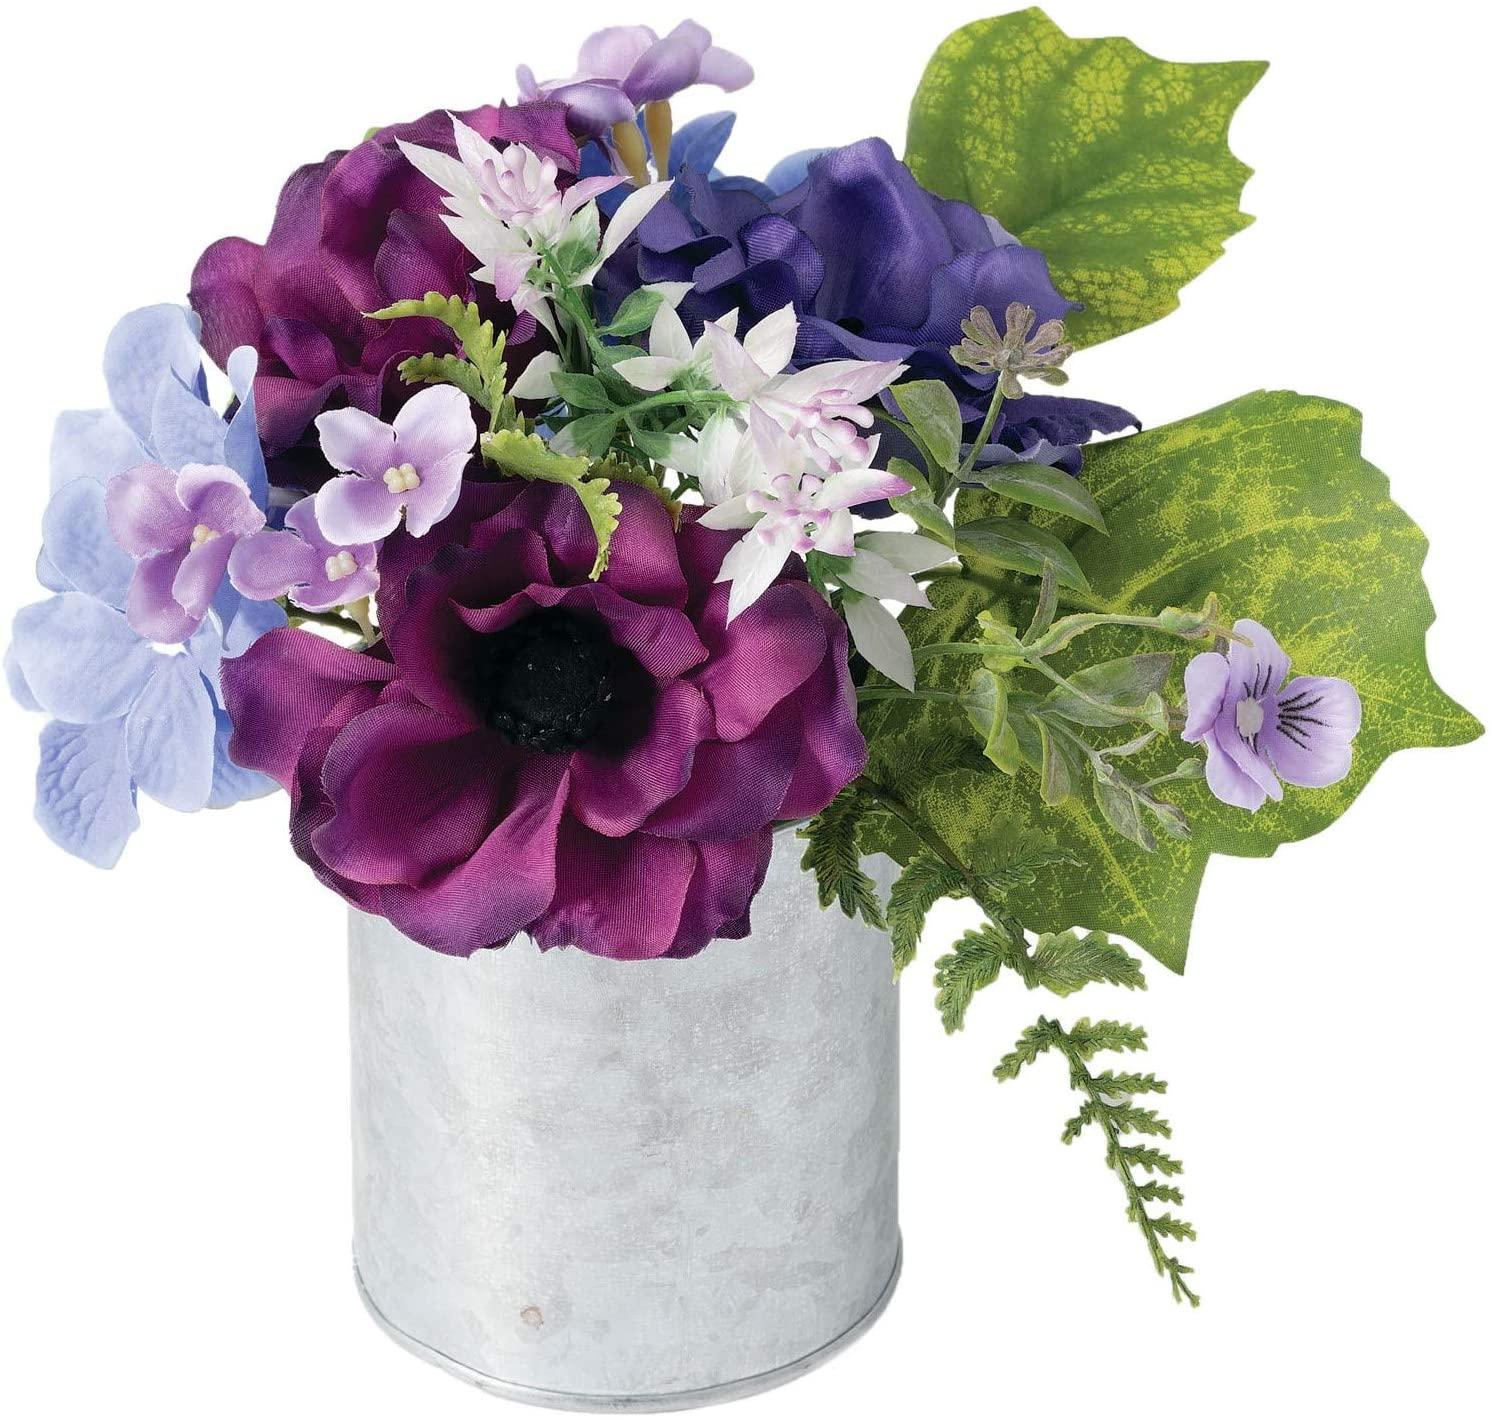 Sullivans Faux Hydrangea and Anemone Premade Flower Arrangement for Living Room, Kitchen, or Office Floral Decor (DOT201)